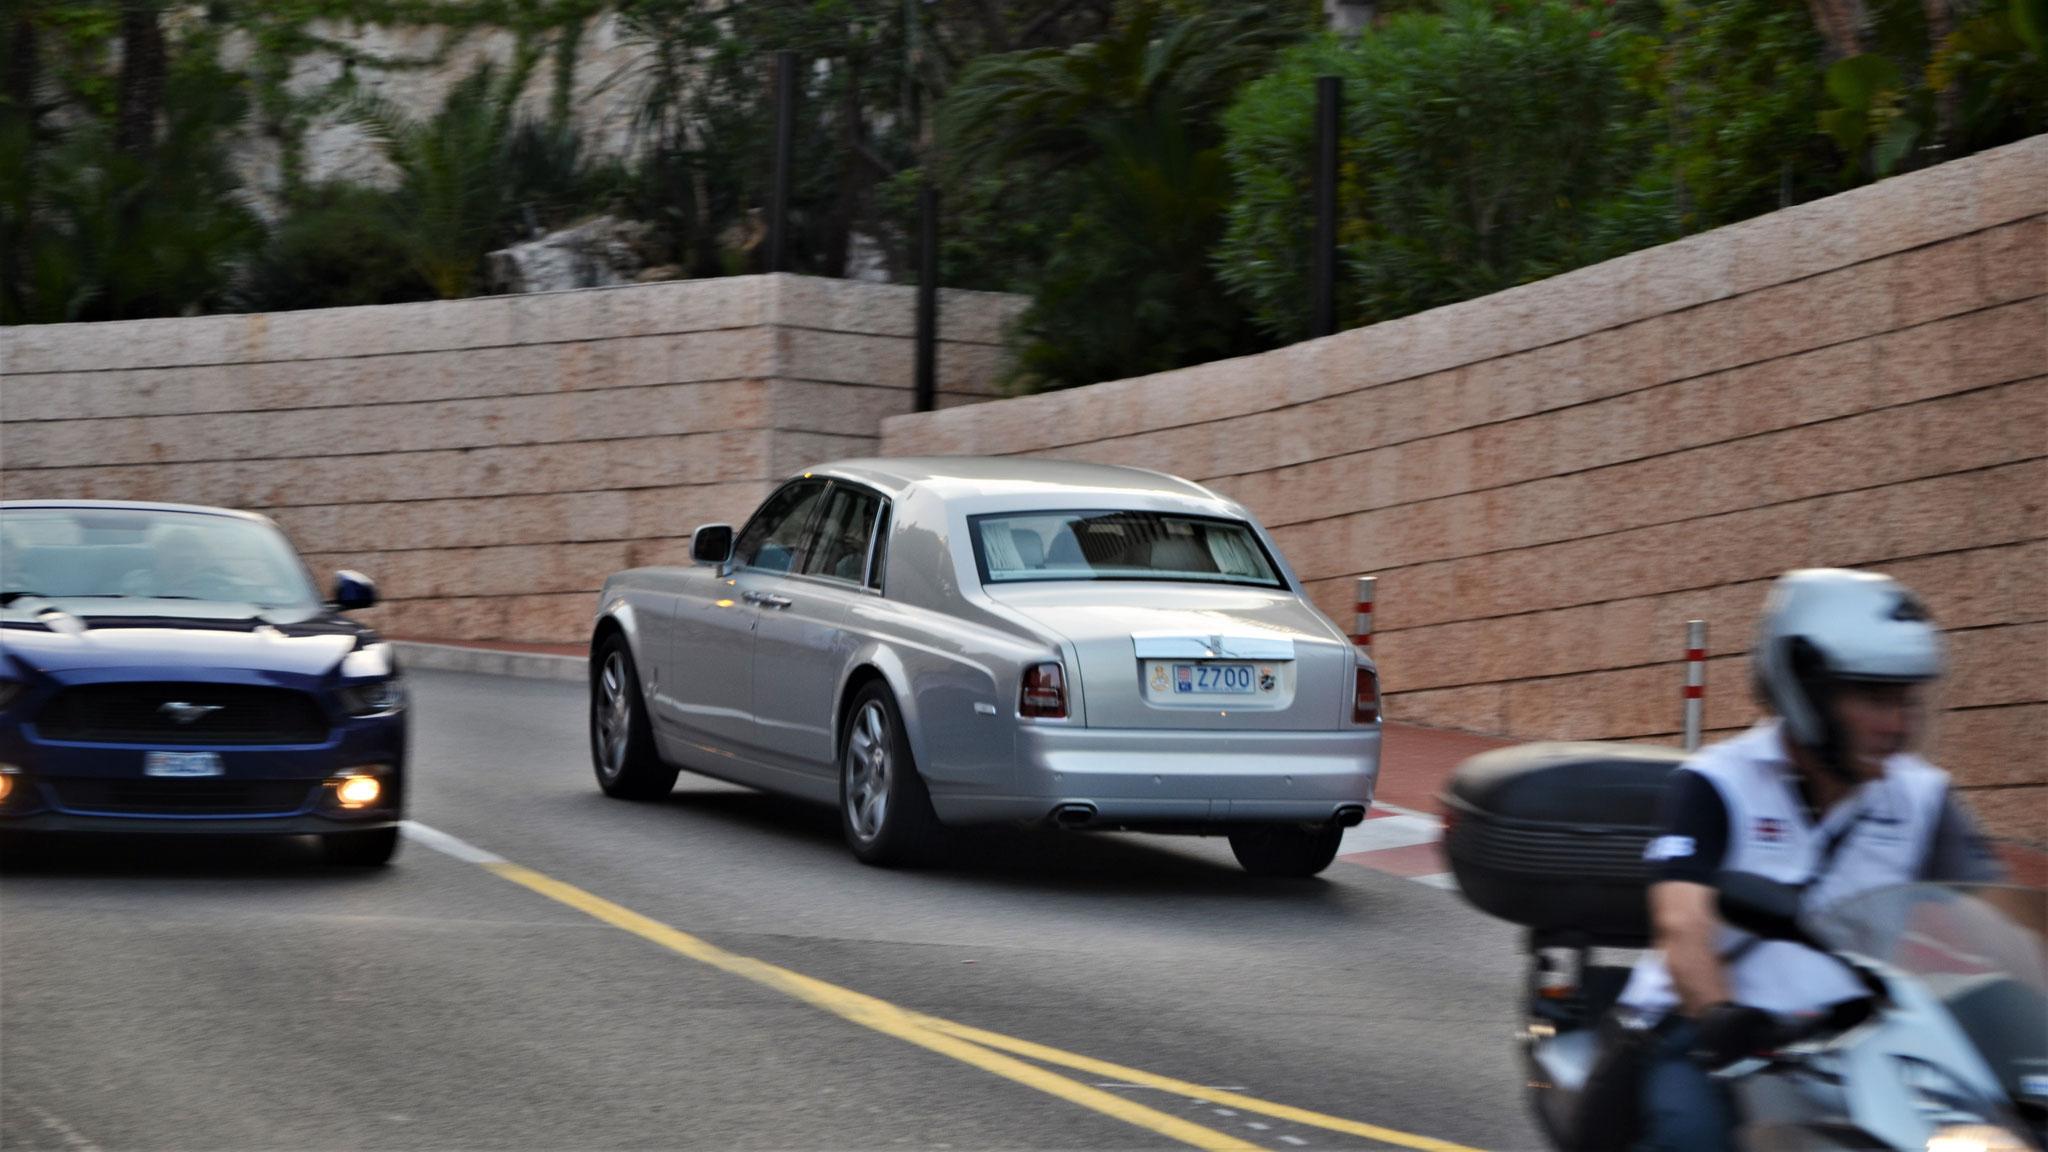 Rolls Royce Phantom - Z700 (MC)